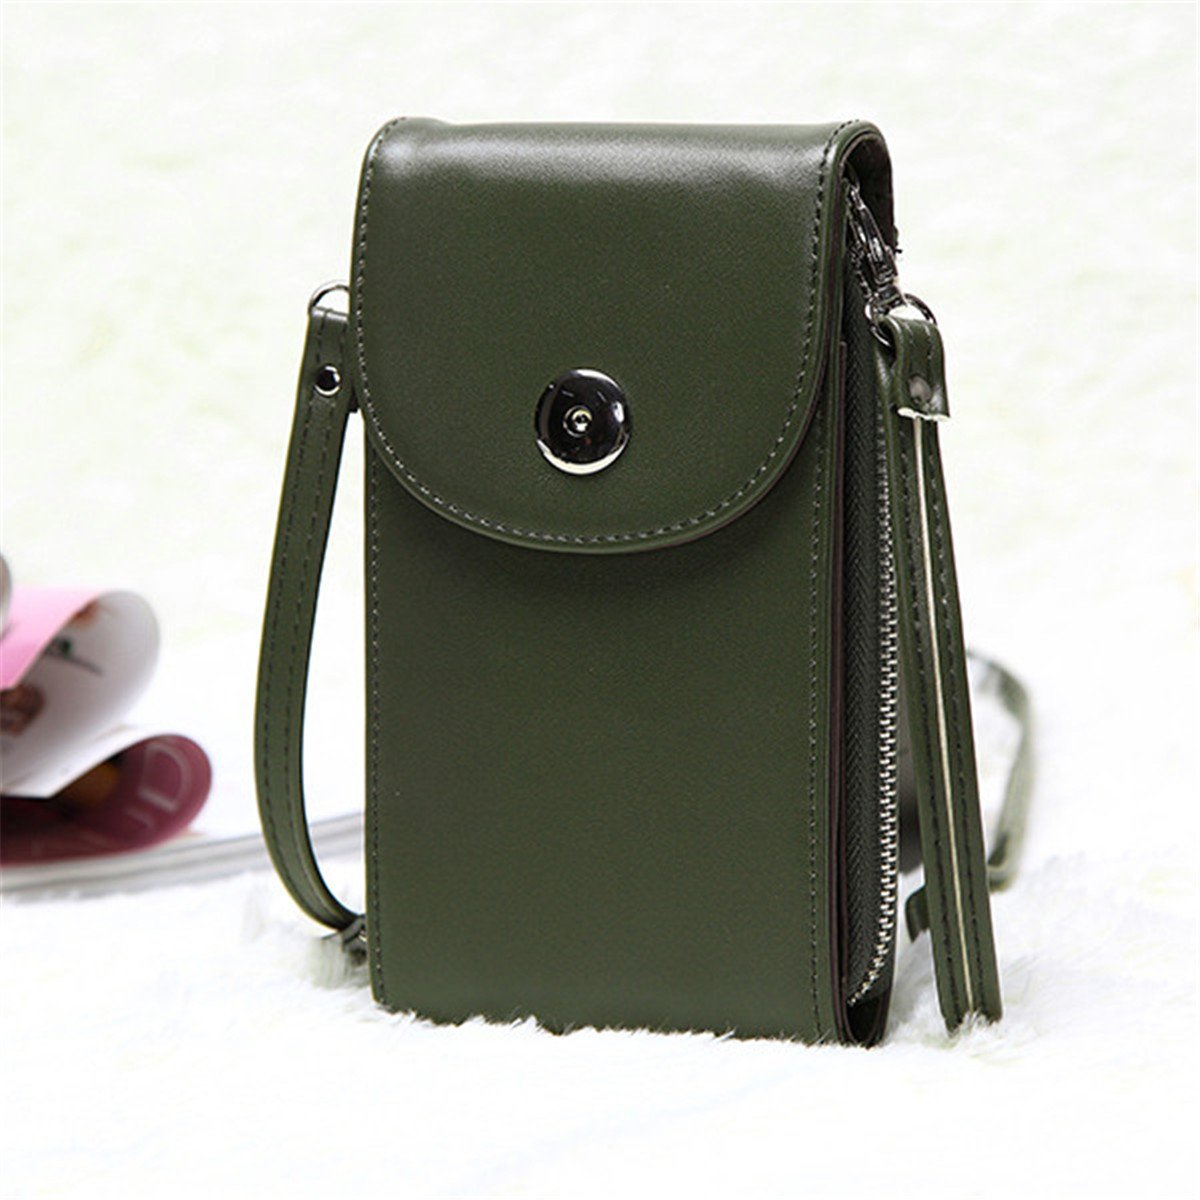 300eaa5cc3 AASSDDFF Diseño Bolsos de las mujeres Coreano Mini Bolsa de Bolsas  Celulares Simple Pequeño Bolso Crossbody Casual Ladies Flap Bolso de Hombro  Verde, ...